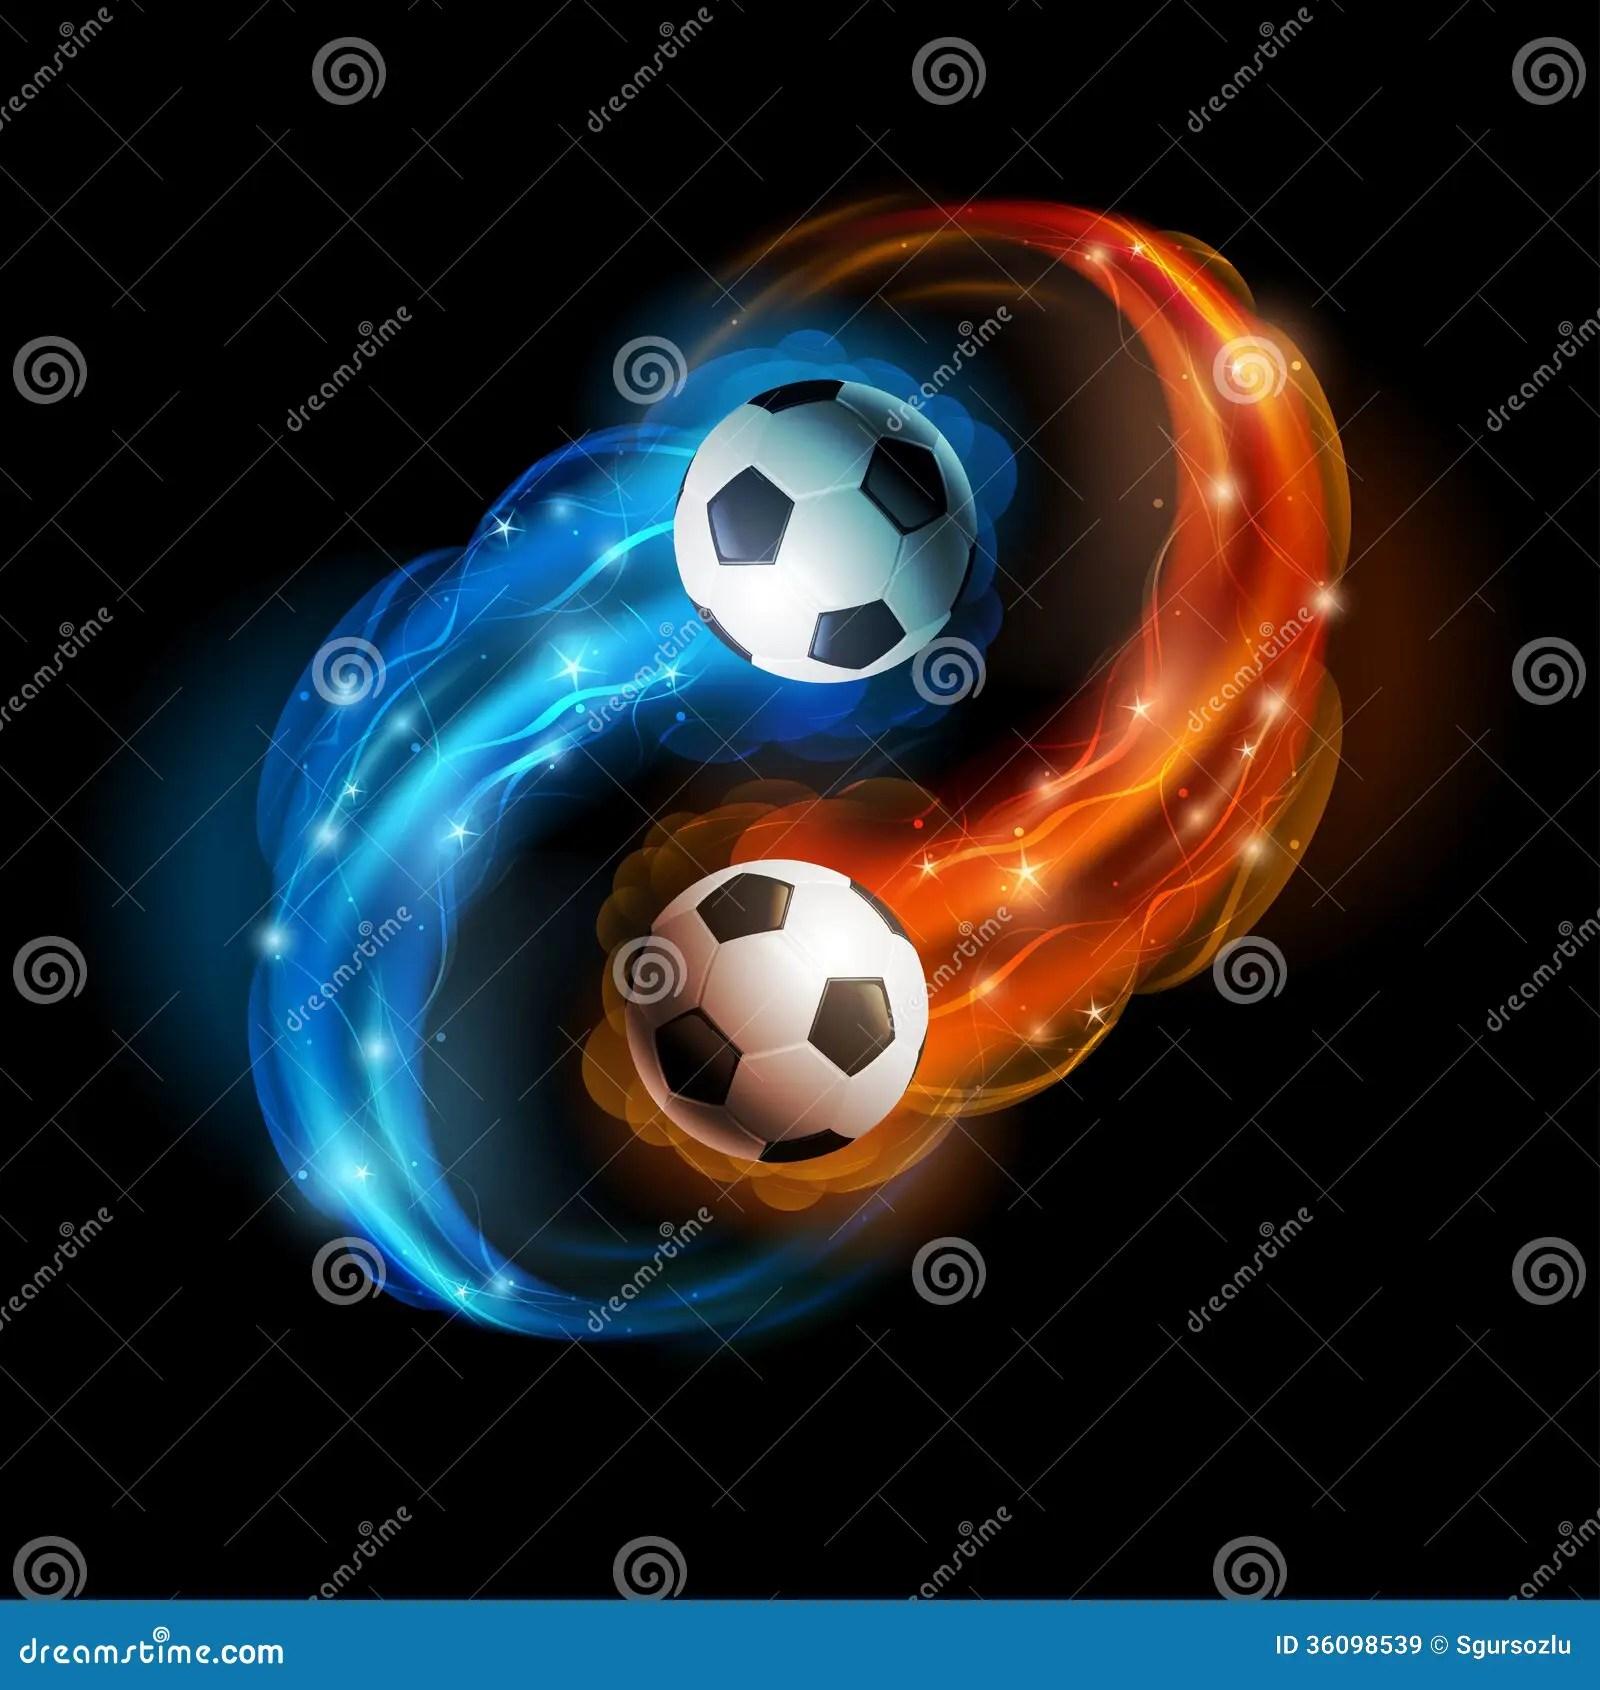 Really Cool 3d Wallpapers Soccer Ball Stock Vector Illustration Of Burning Ball